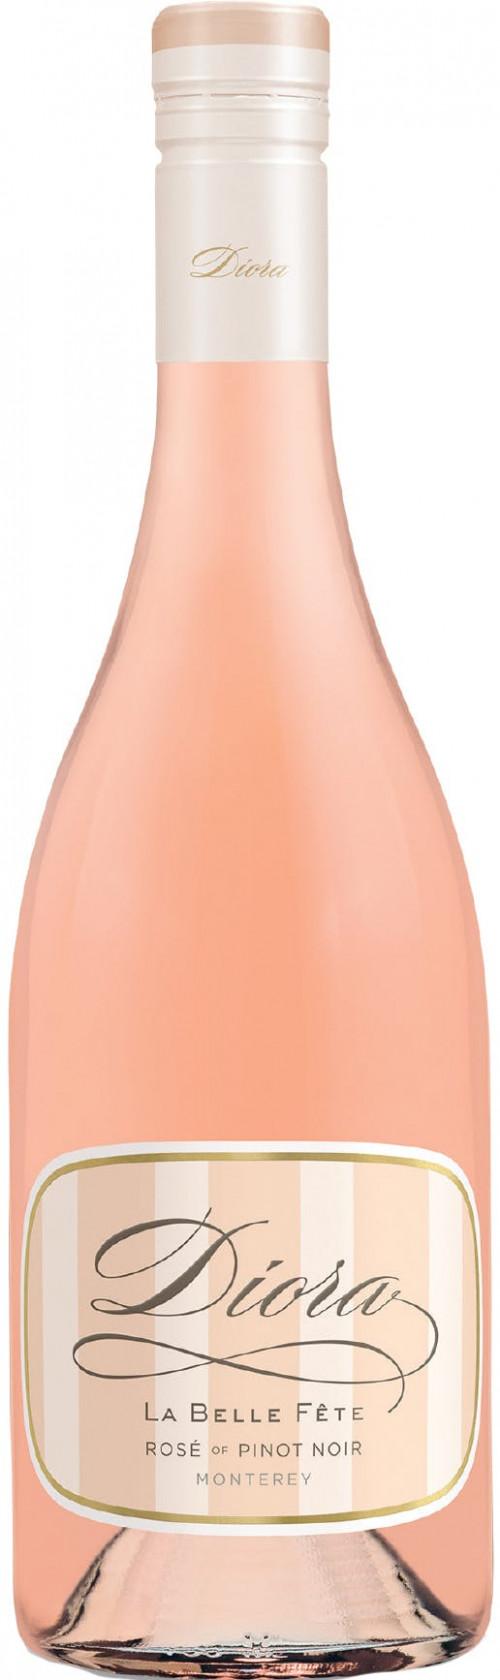 2019 Diora Rose Of Pinot Noir La Belle Fete 750ml